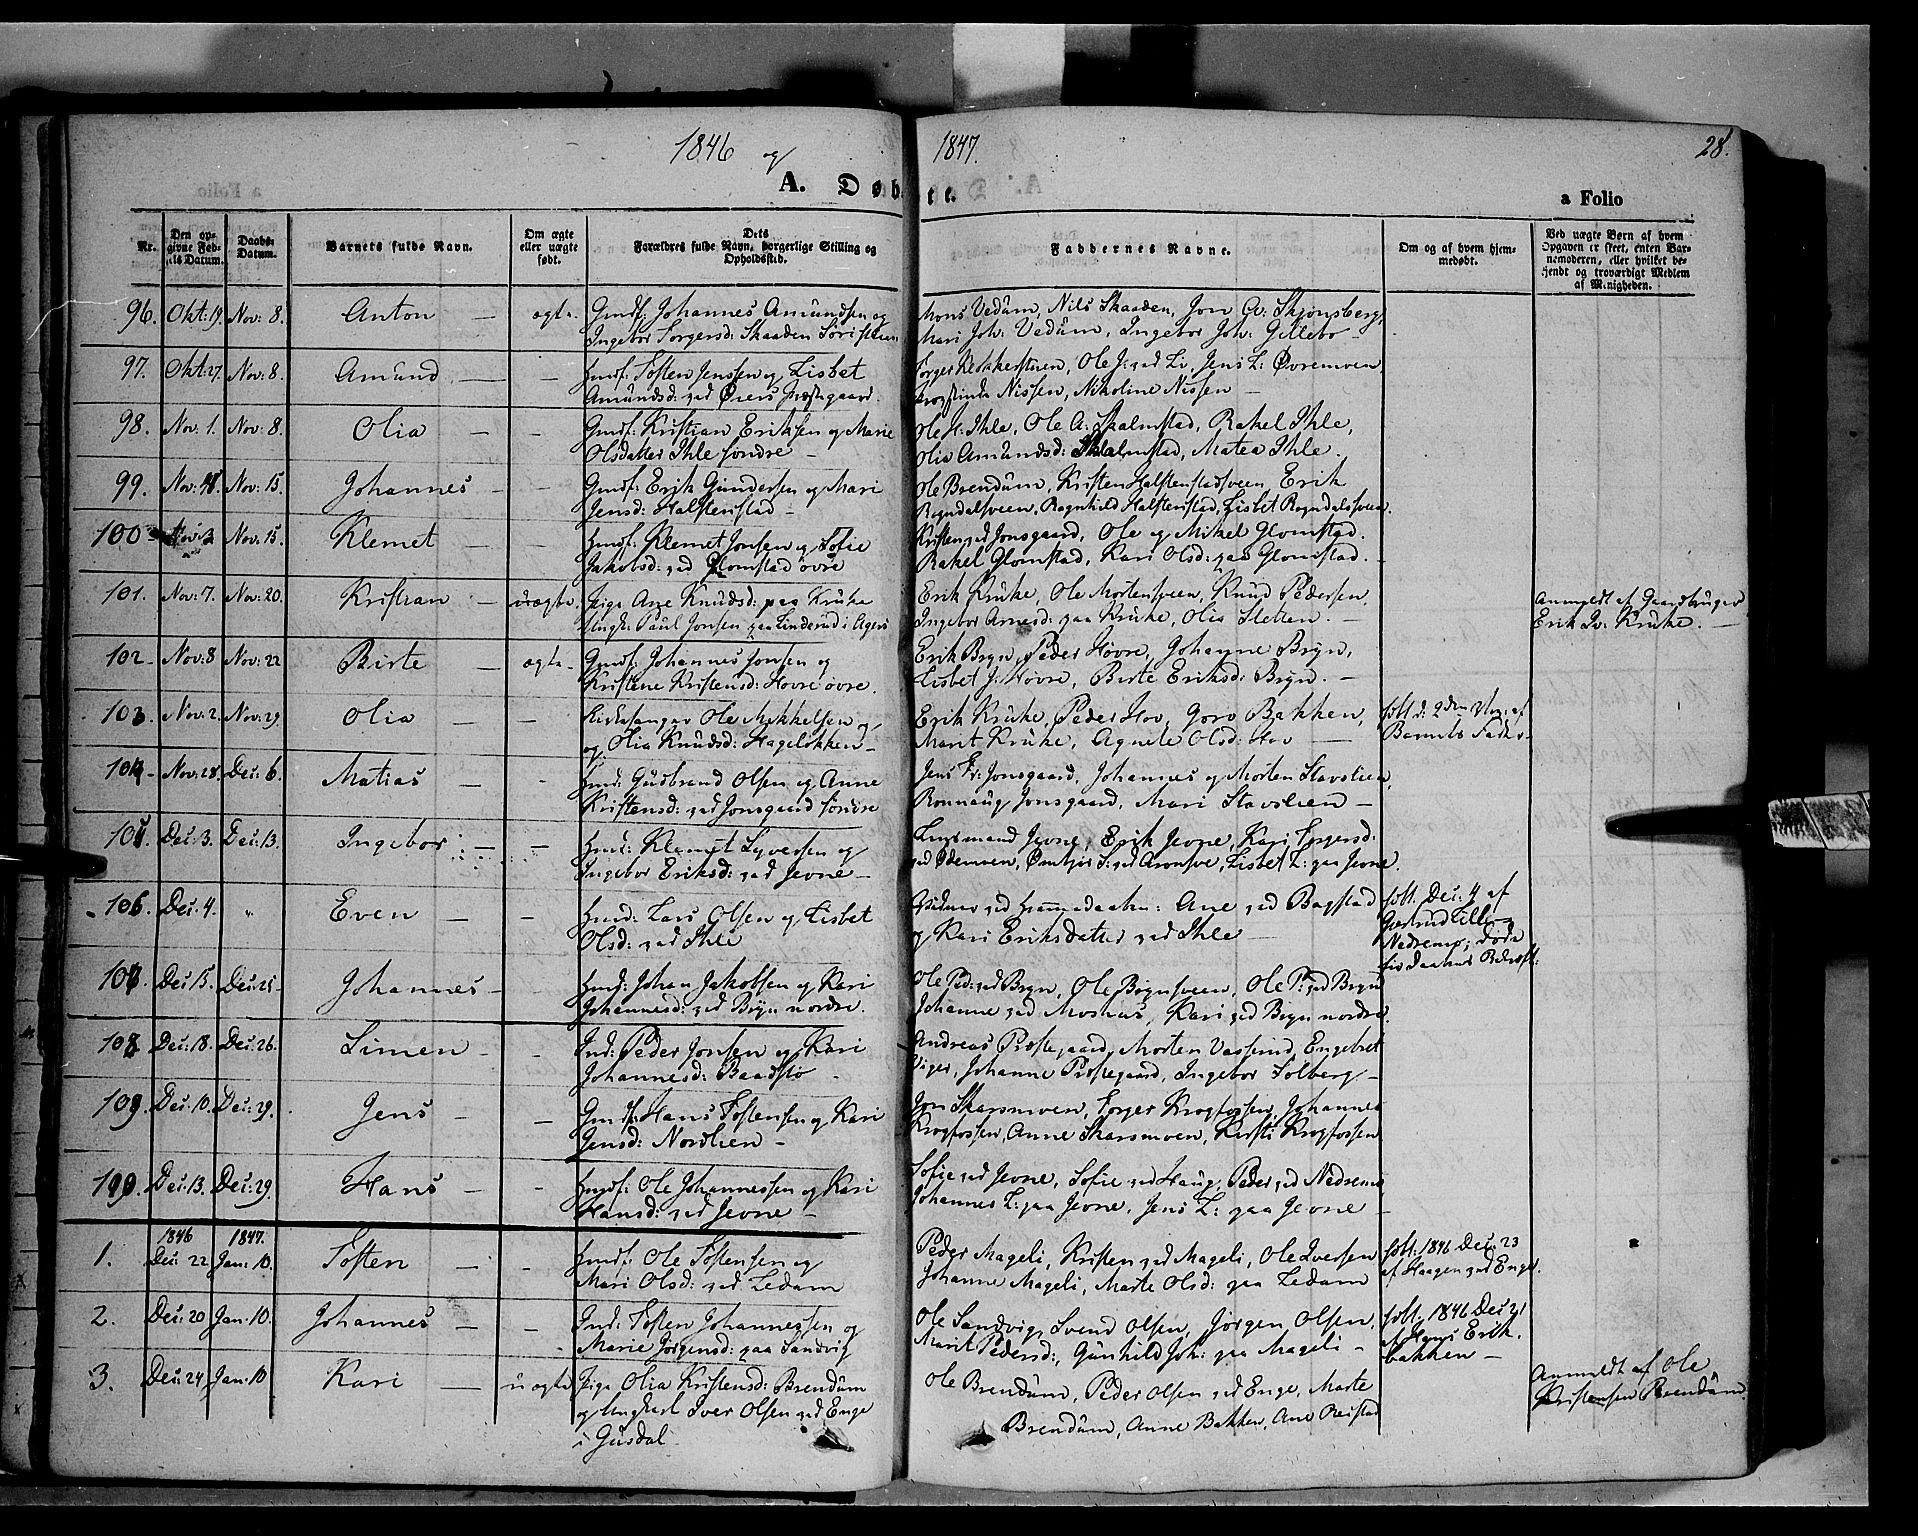 SAH, Øyer prestekontor, Ministerialbok nr. 5, 1842-1857, s. 28